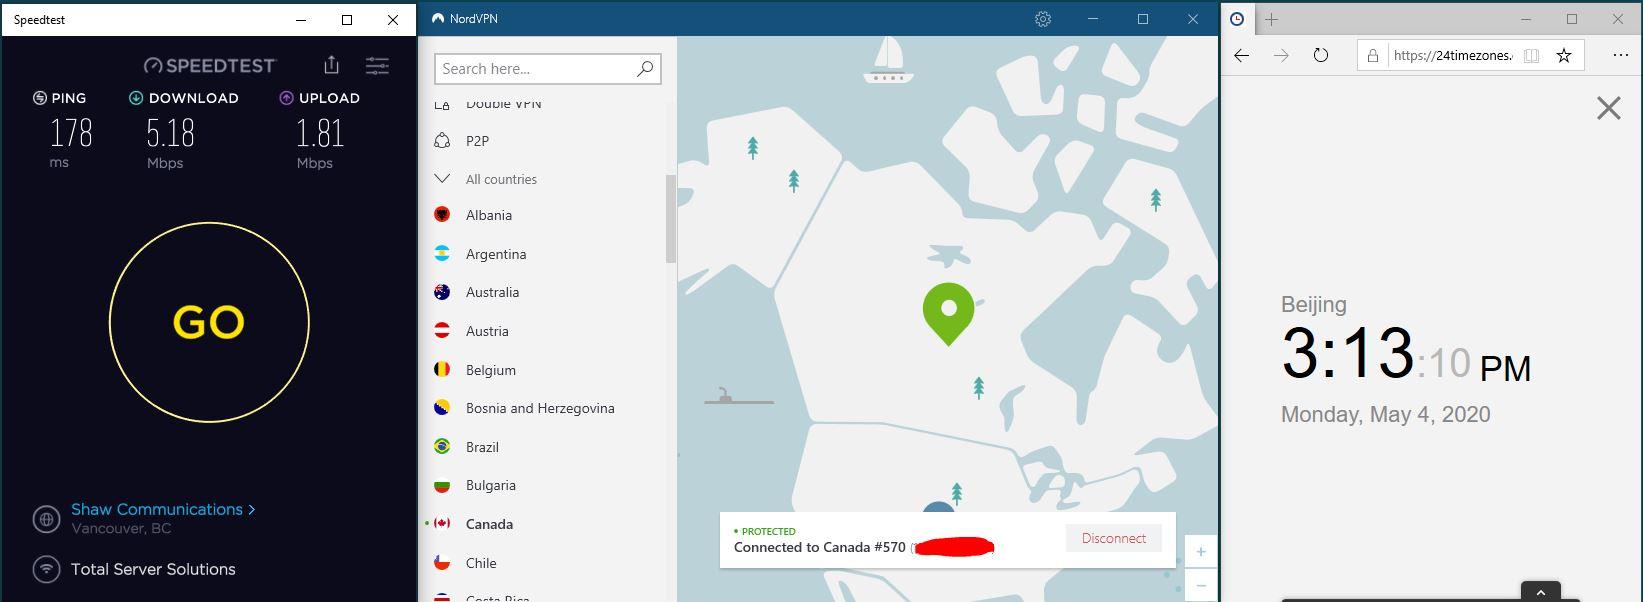 Windows10 NordVPN 混淆协议关闭 Canada #570 中国VPN 翻墙 科学上网 SpeedTest测速-20200504